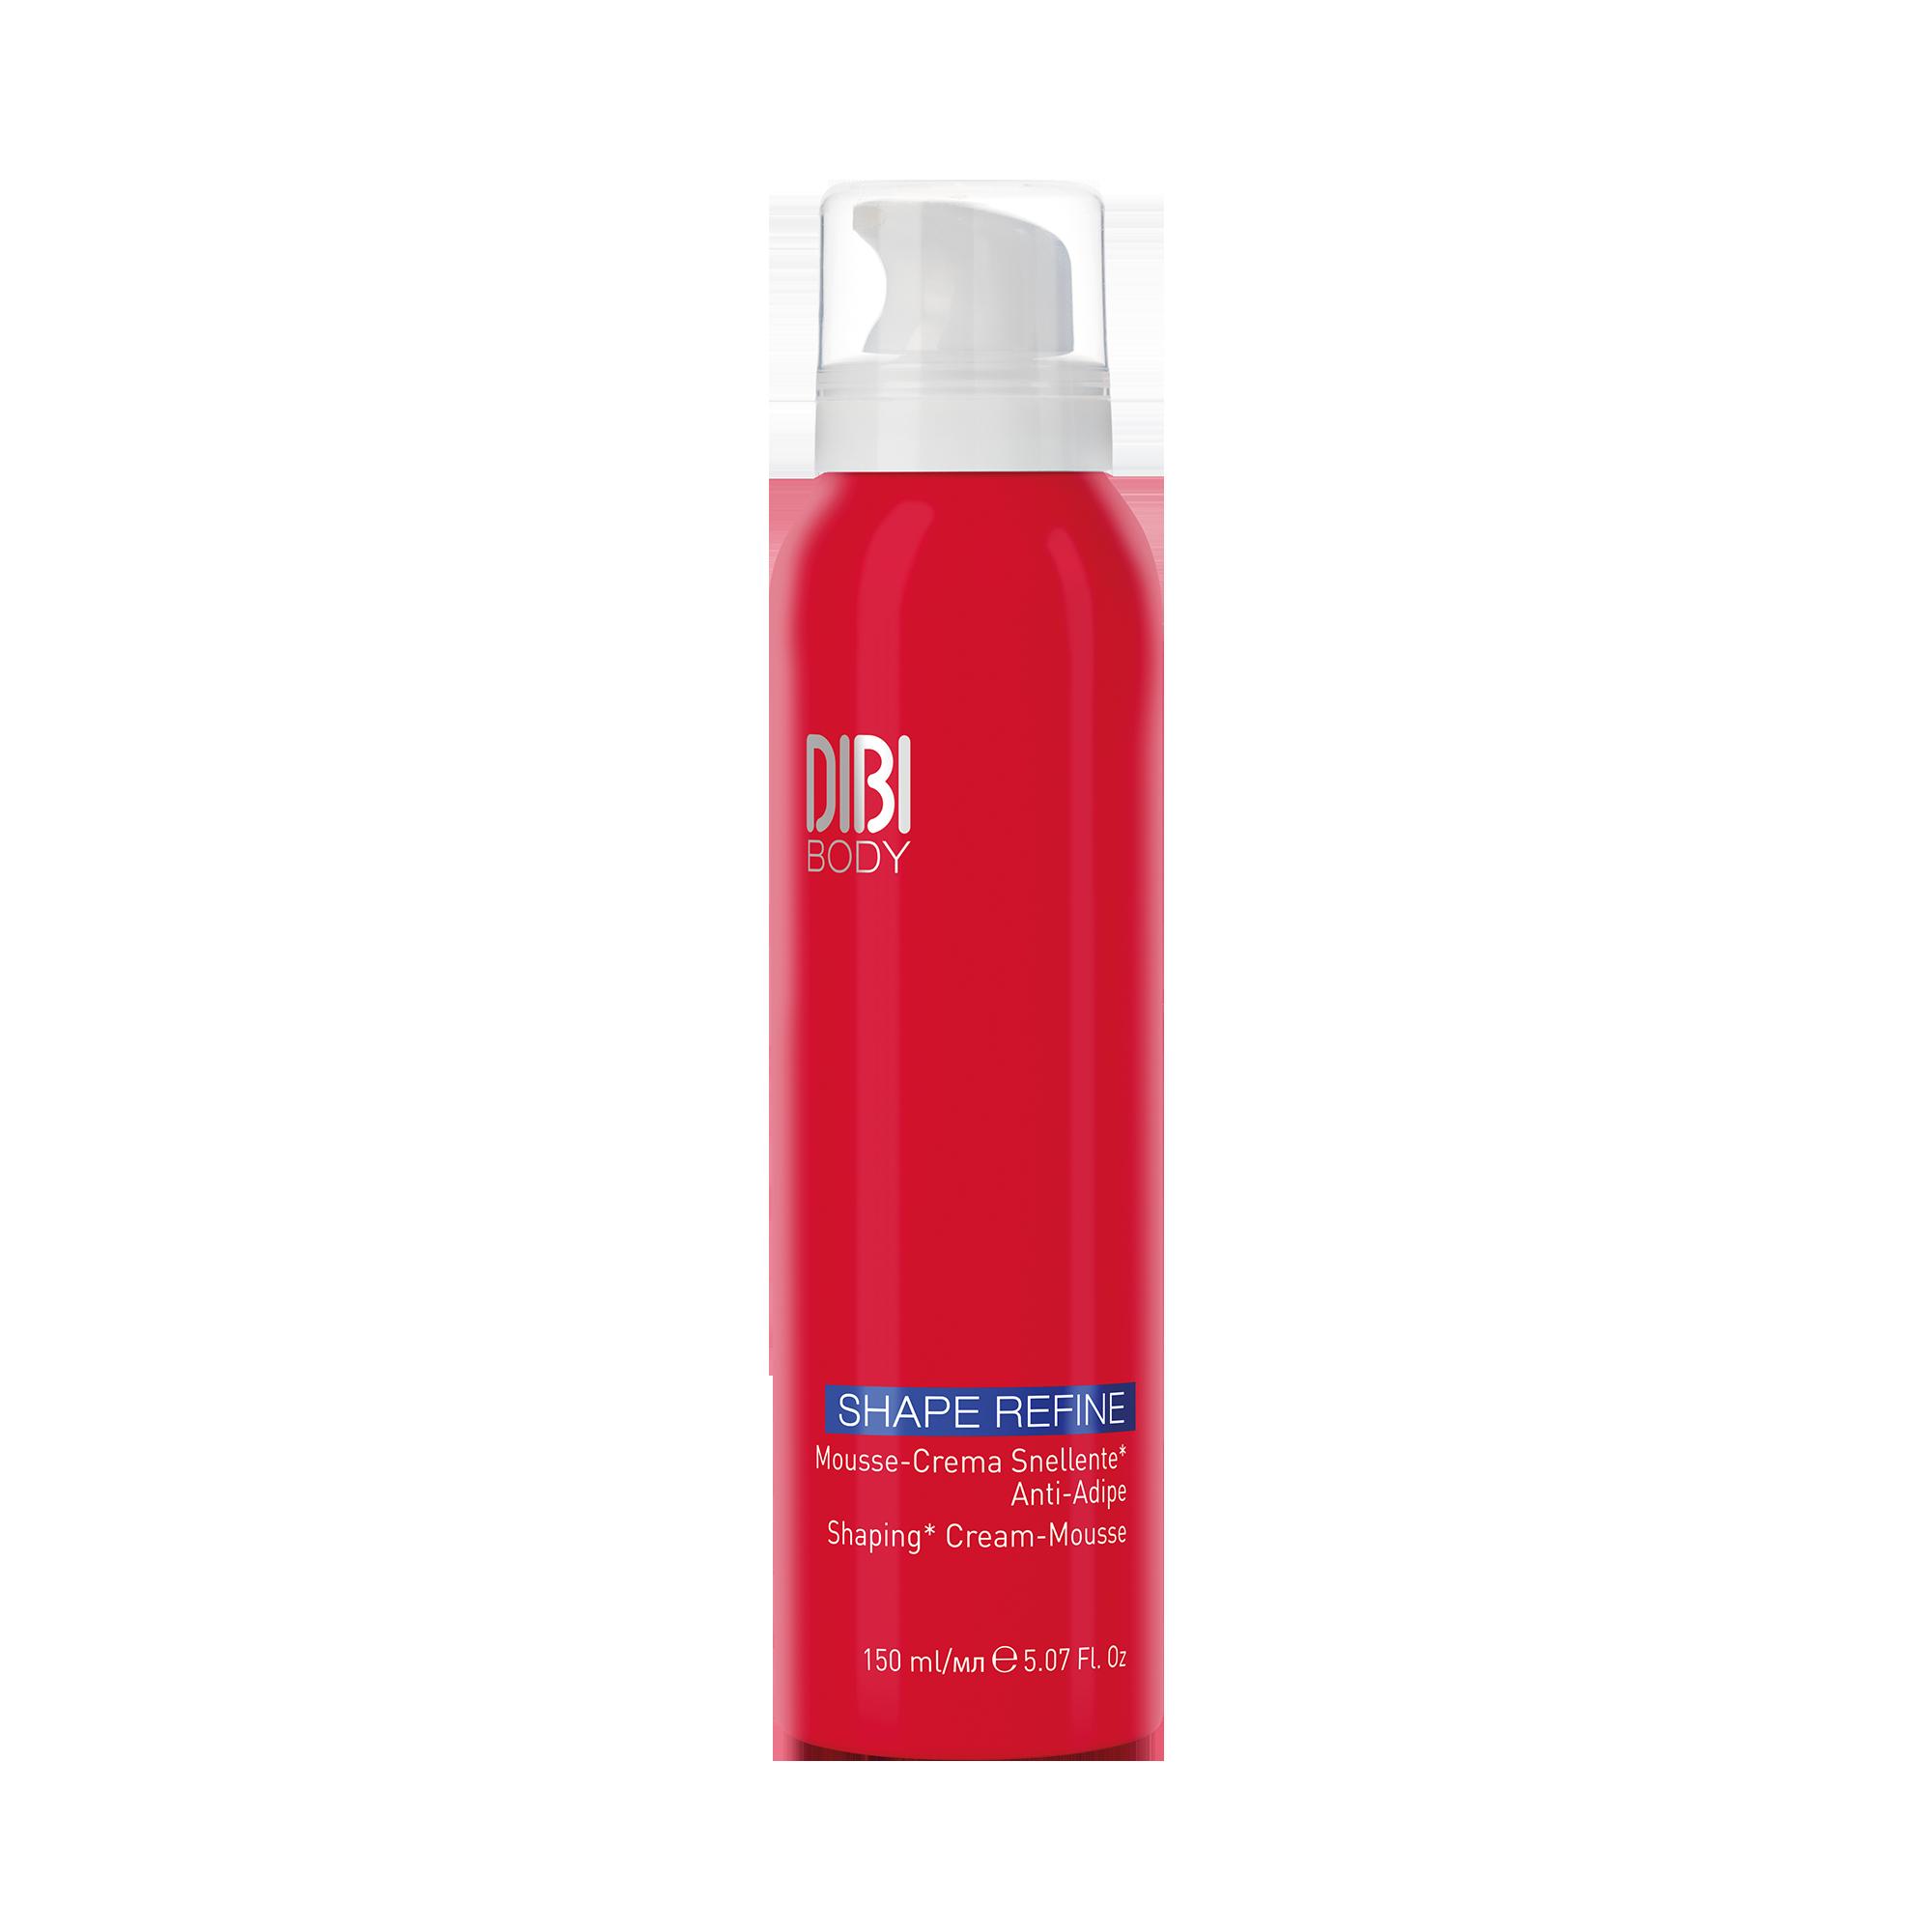 DIBI MILANO SHAPE REFINE Mousse-crema snellente anti-adipe